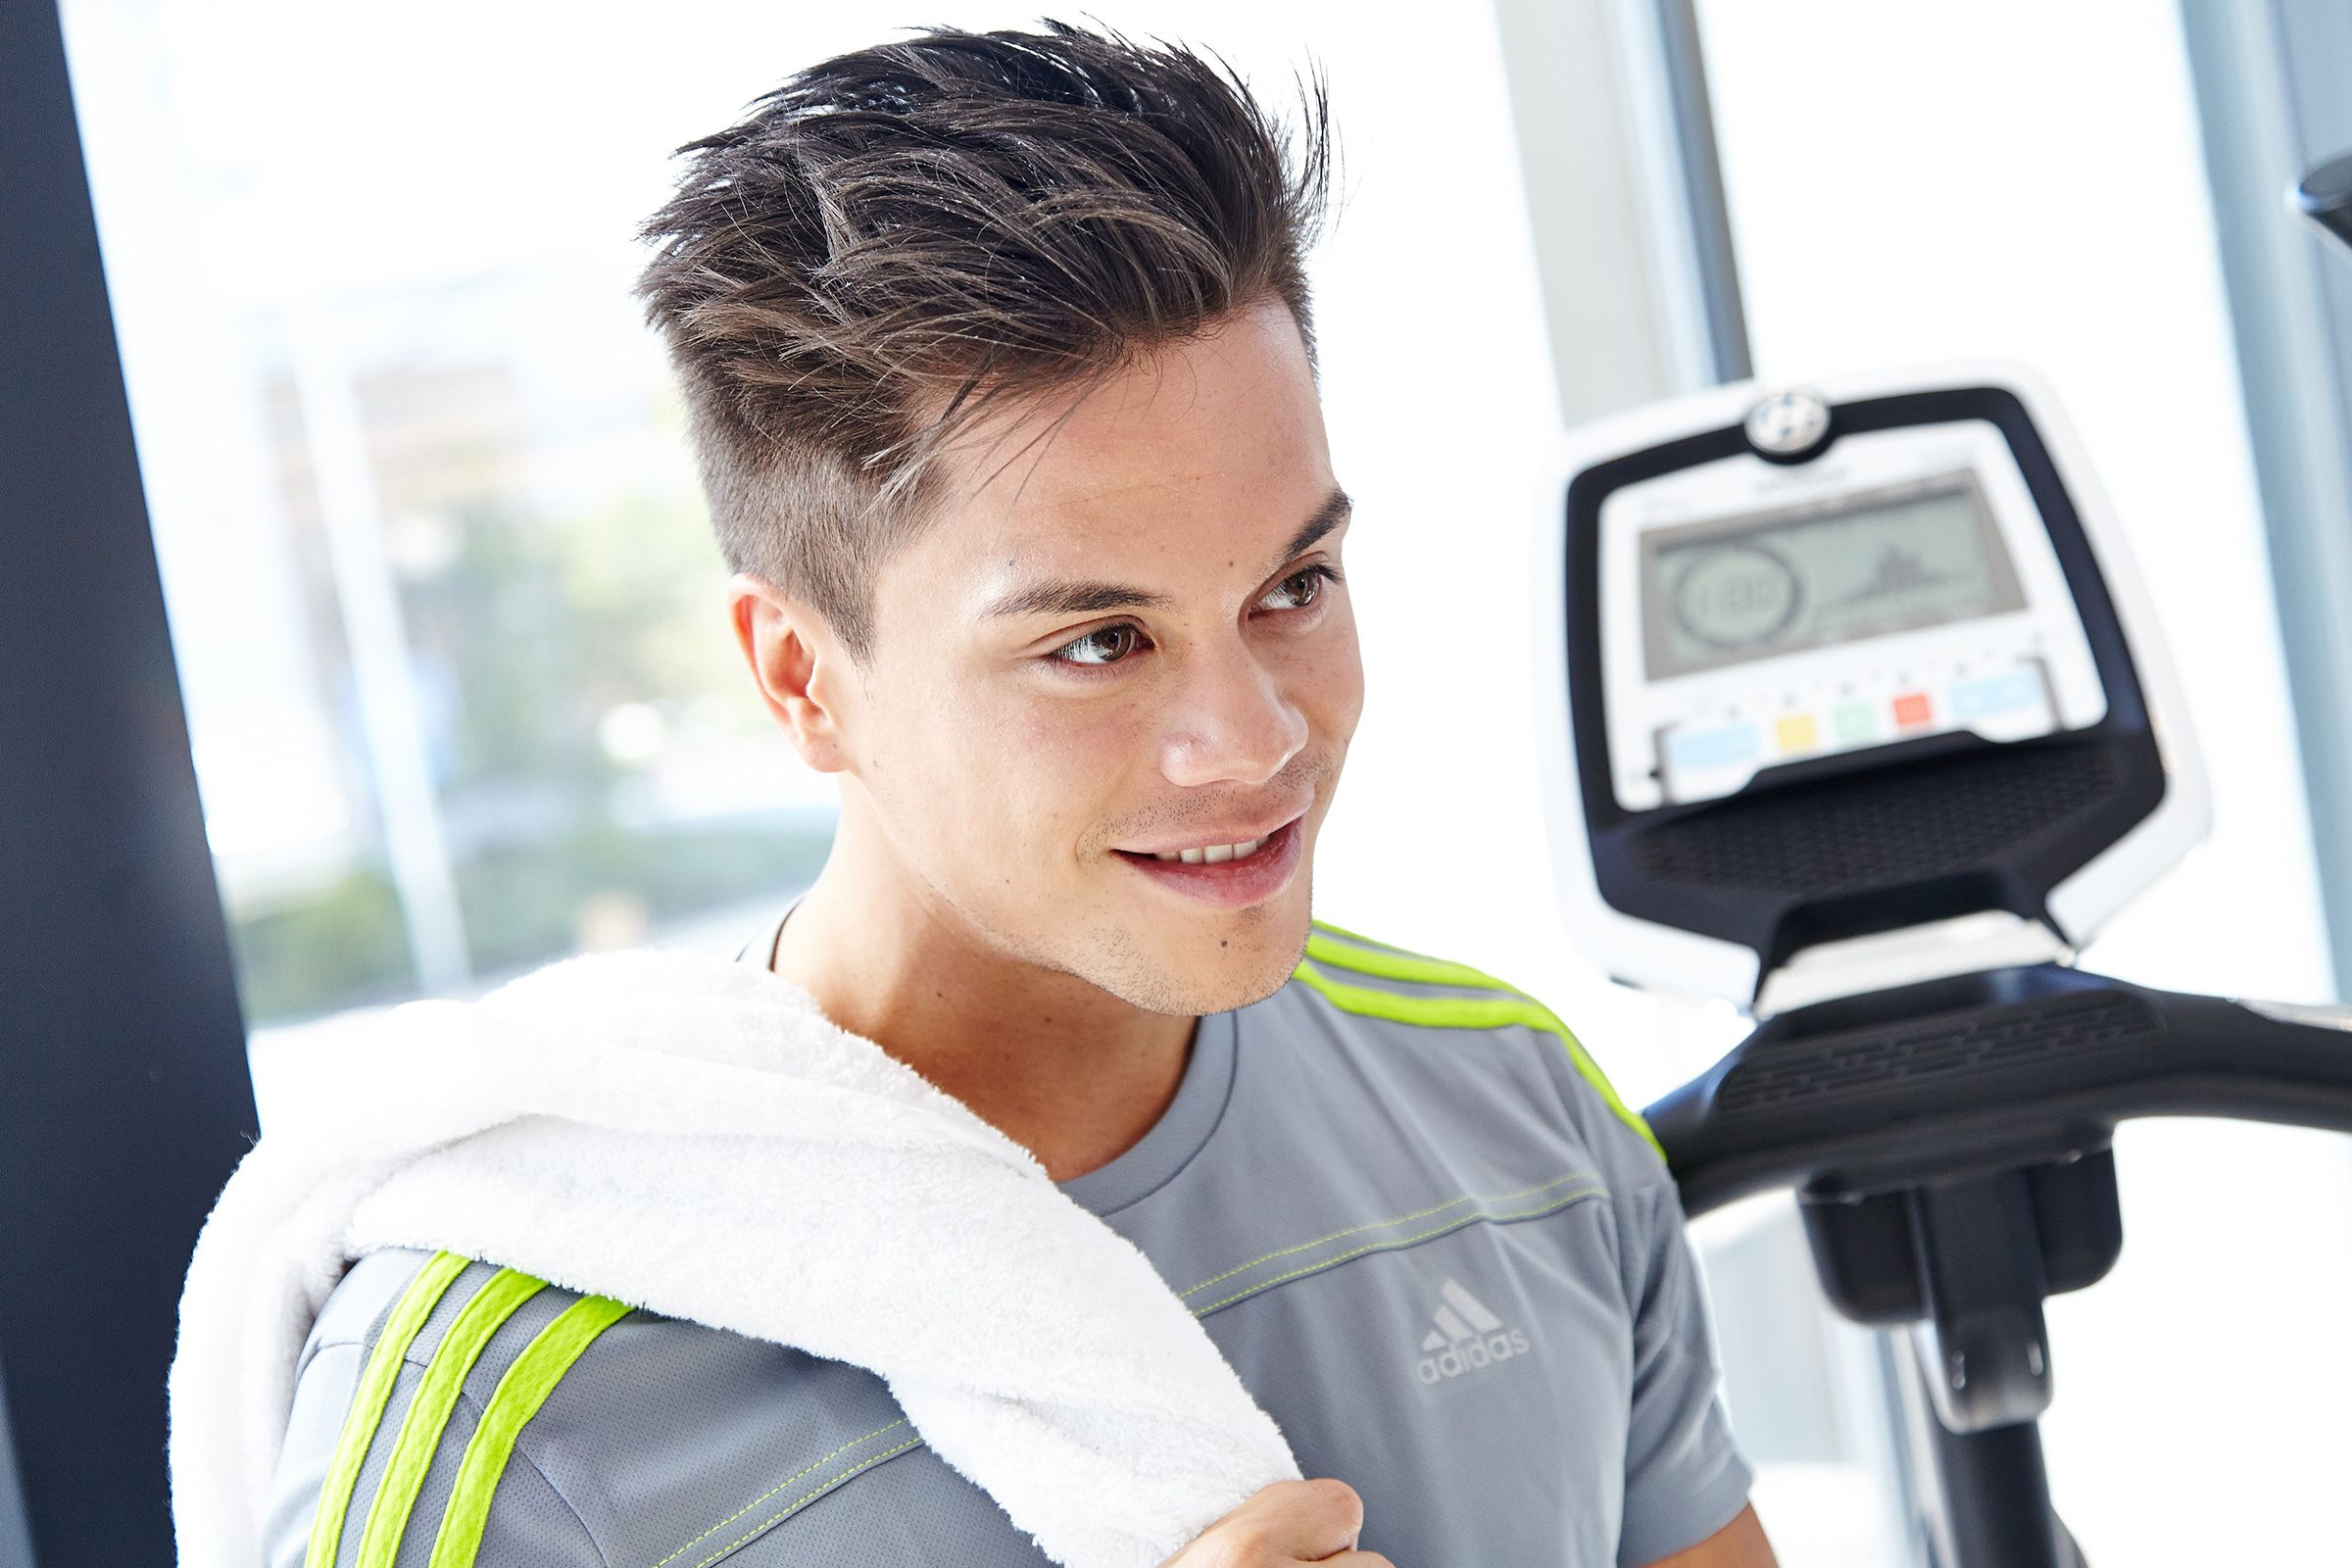 Dsds Christopher Schnell Ist Model Fur Fitnessgerate Starsontv Dsds Models Fitness